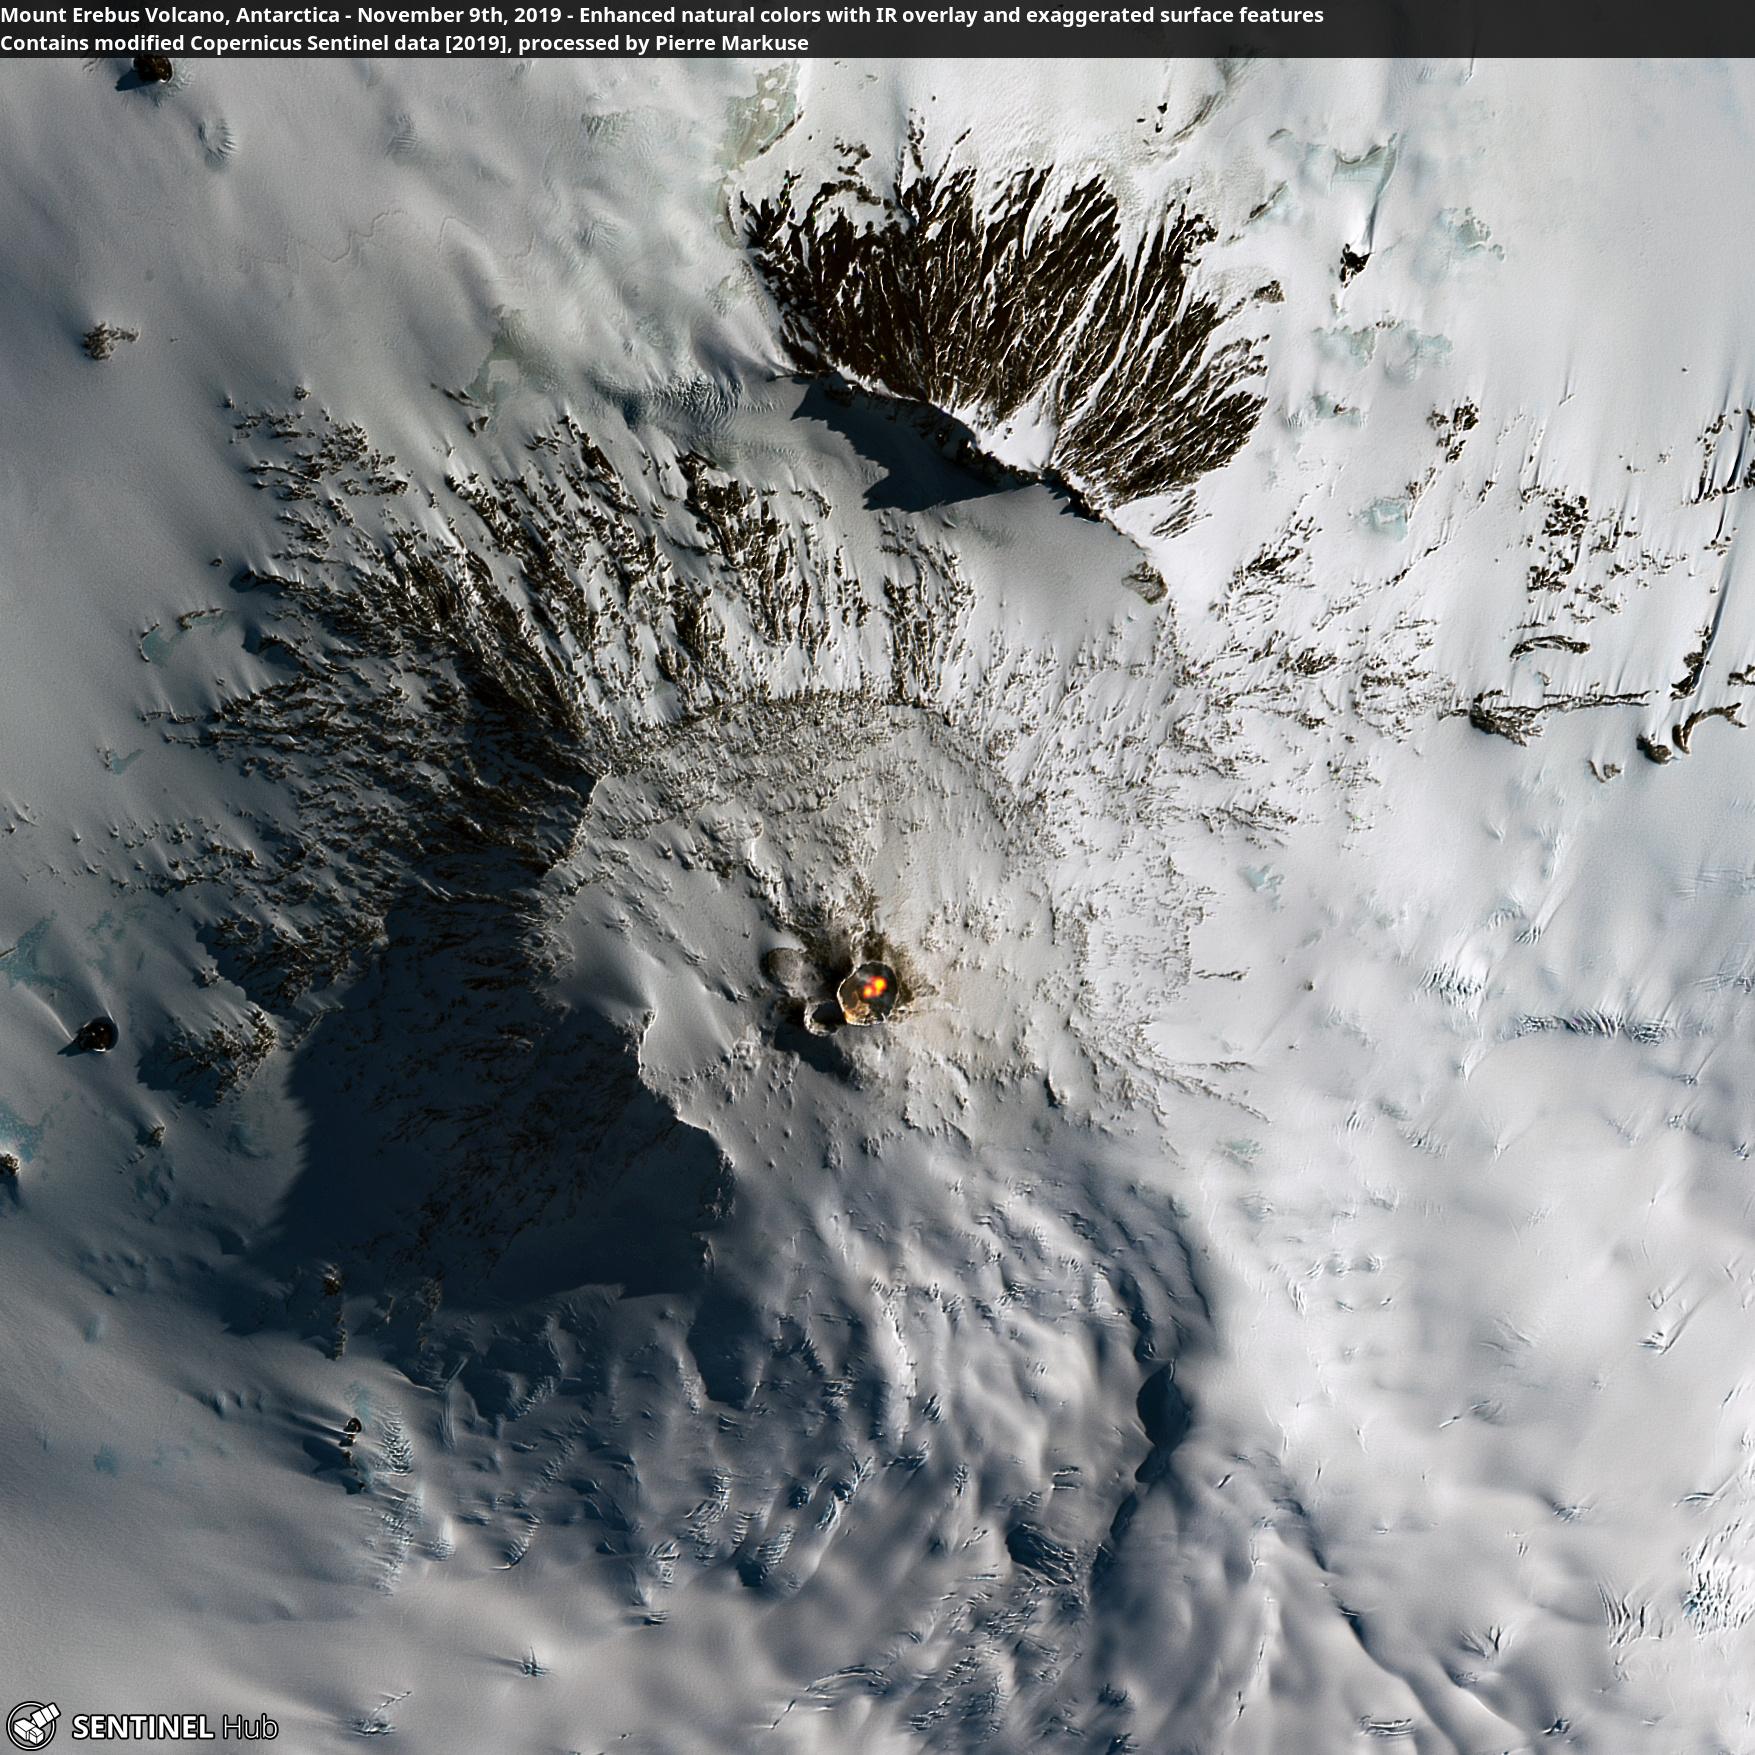 Mount Erebus Volcano Antarctica